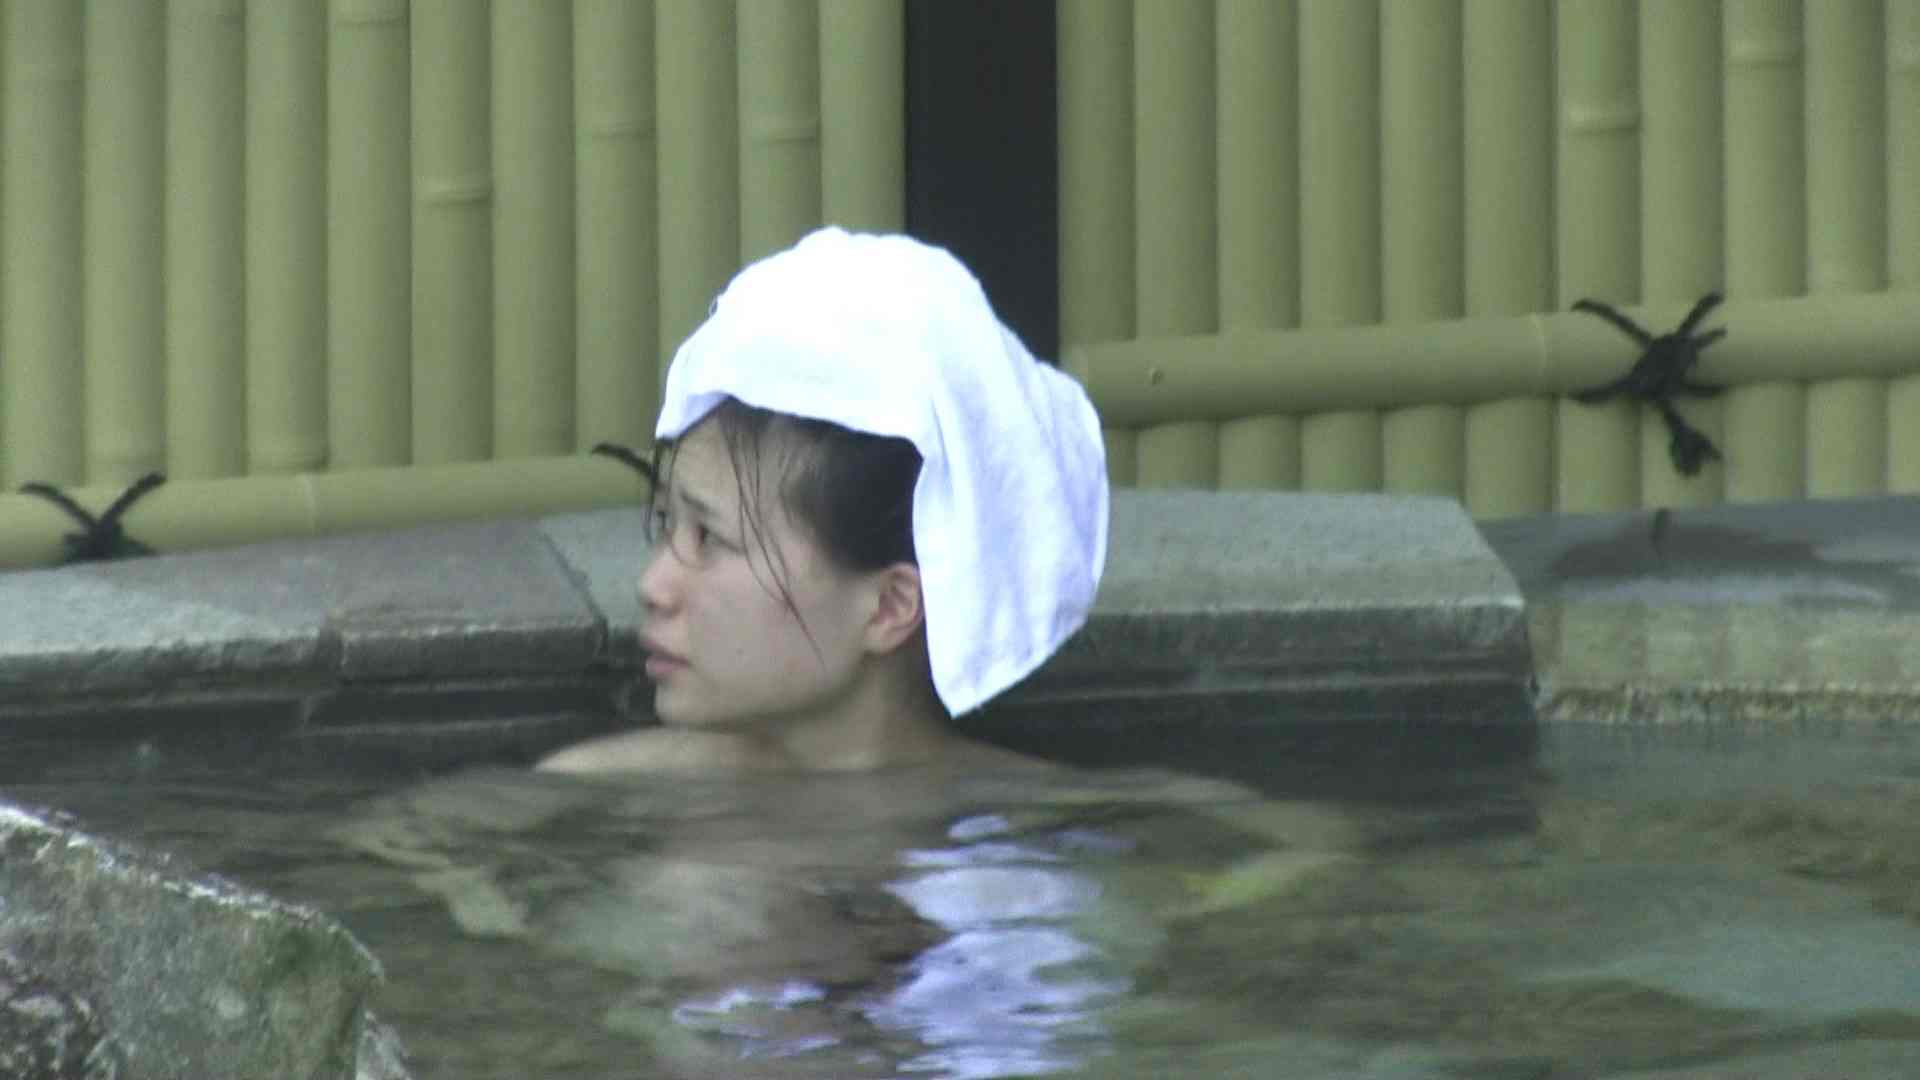 Aquaな露天風呂Vol.183 露天風呂編  104PIX 62